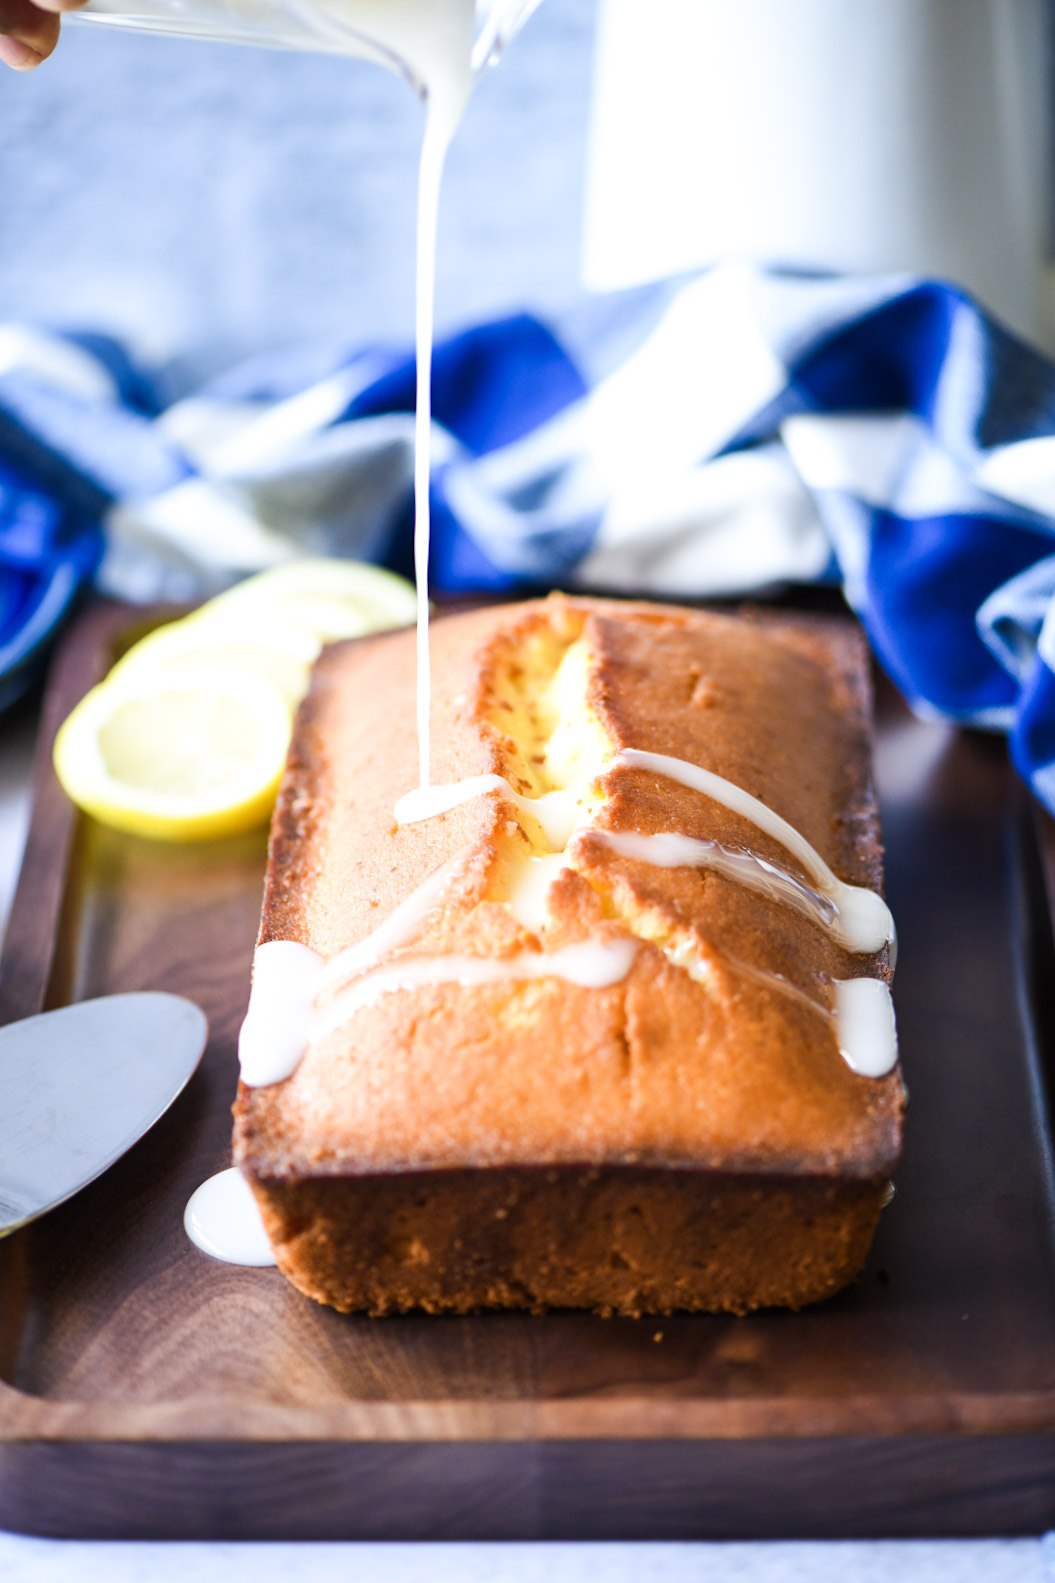 Pouring lemon glaze over the lemon pound cake